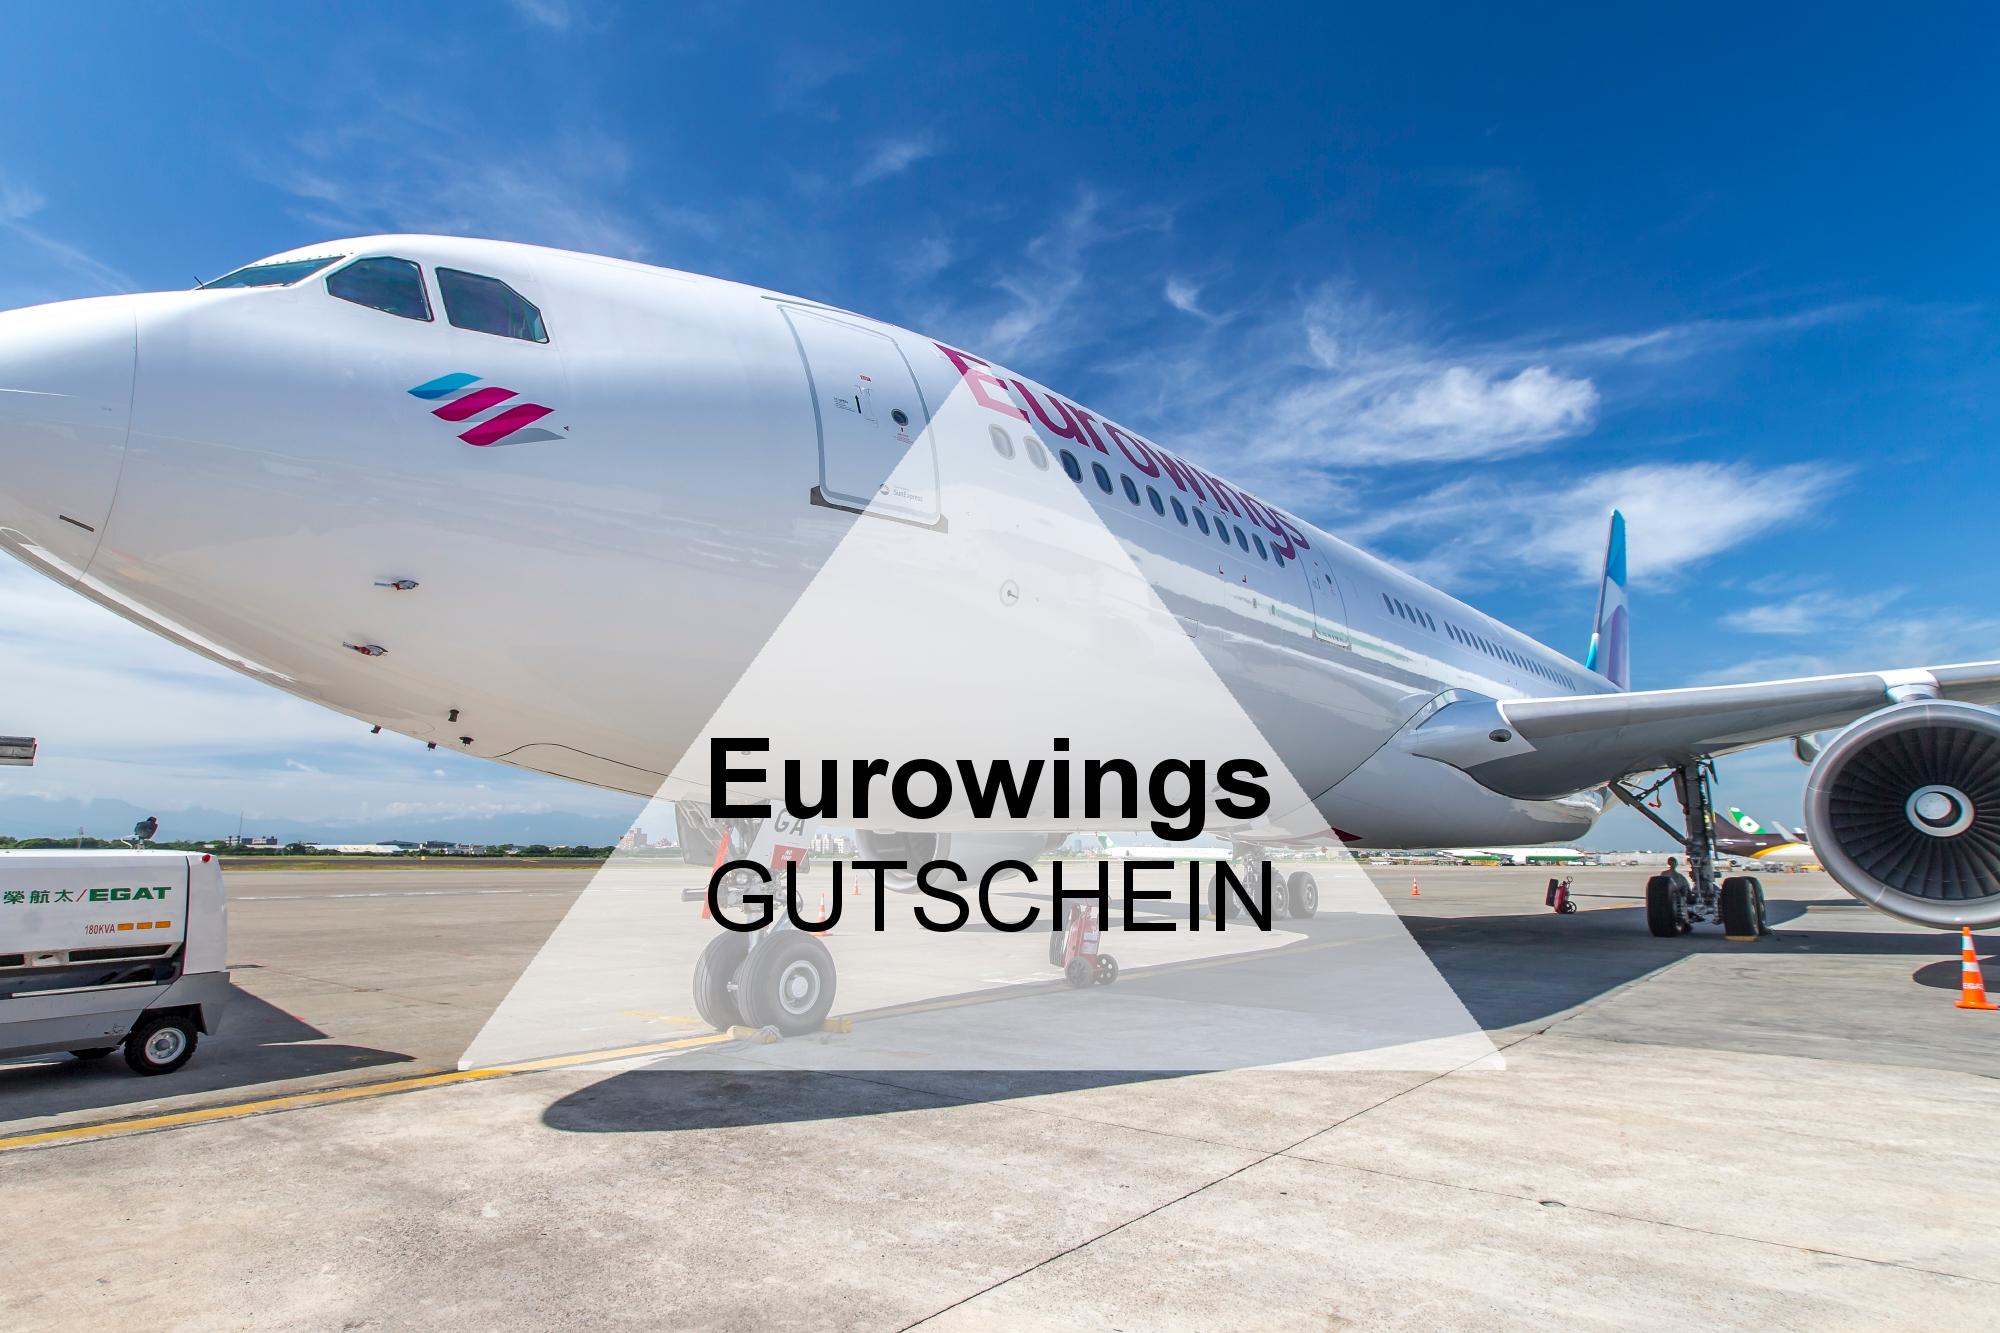 eurowings gutschein 10 rabatt auf eure flugbuchung. Black Bedroom Furniture Sets. Home Design Ideas